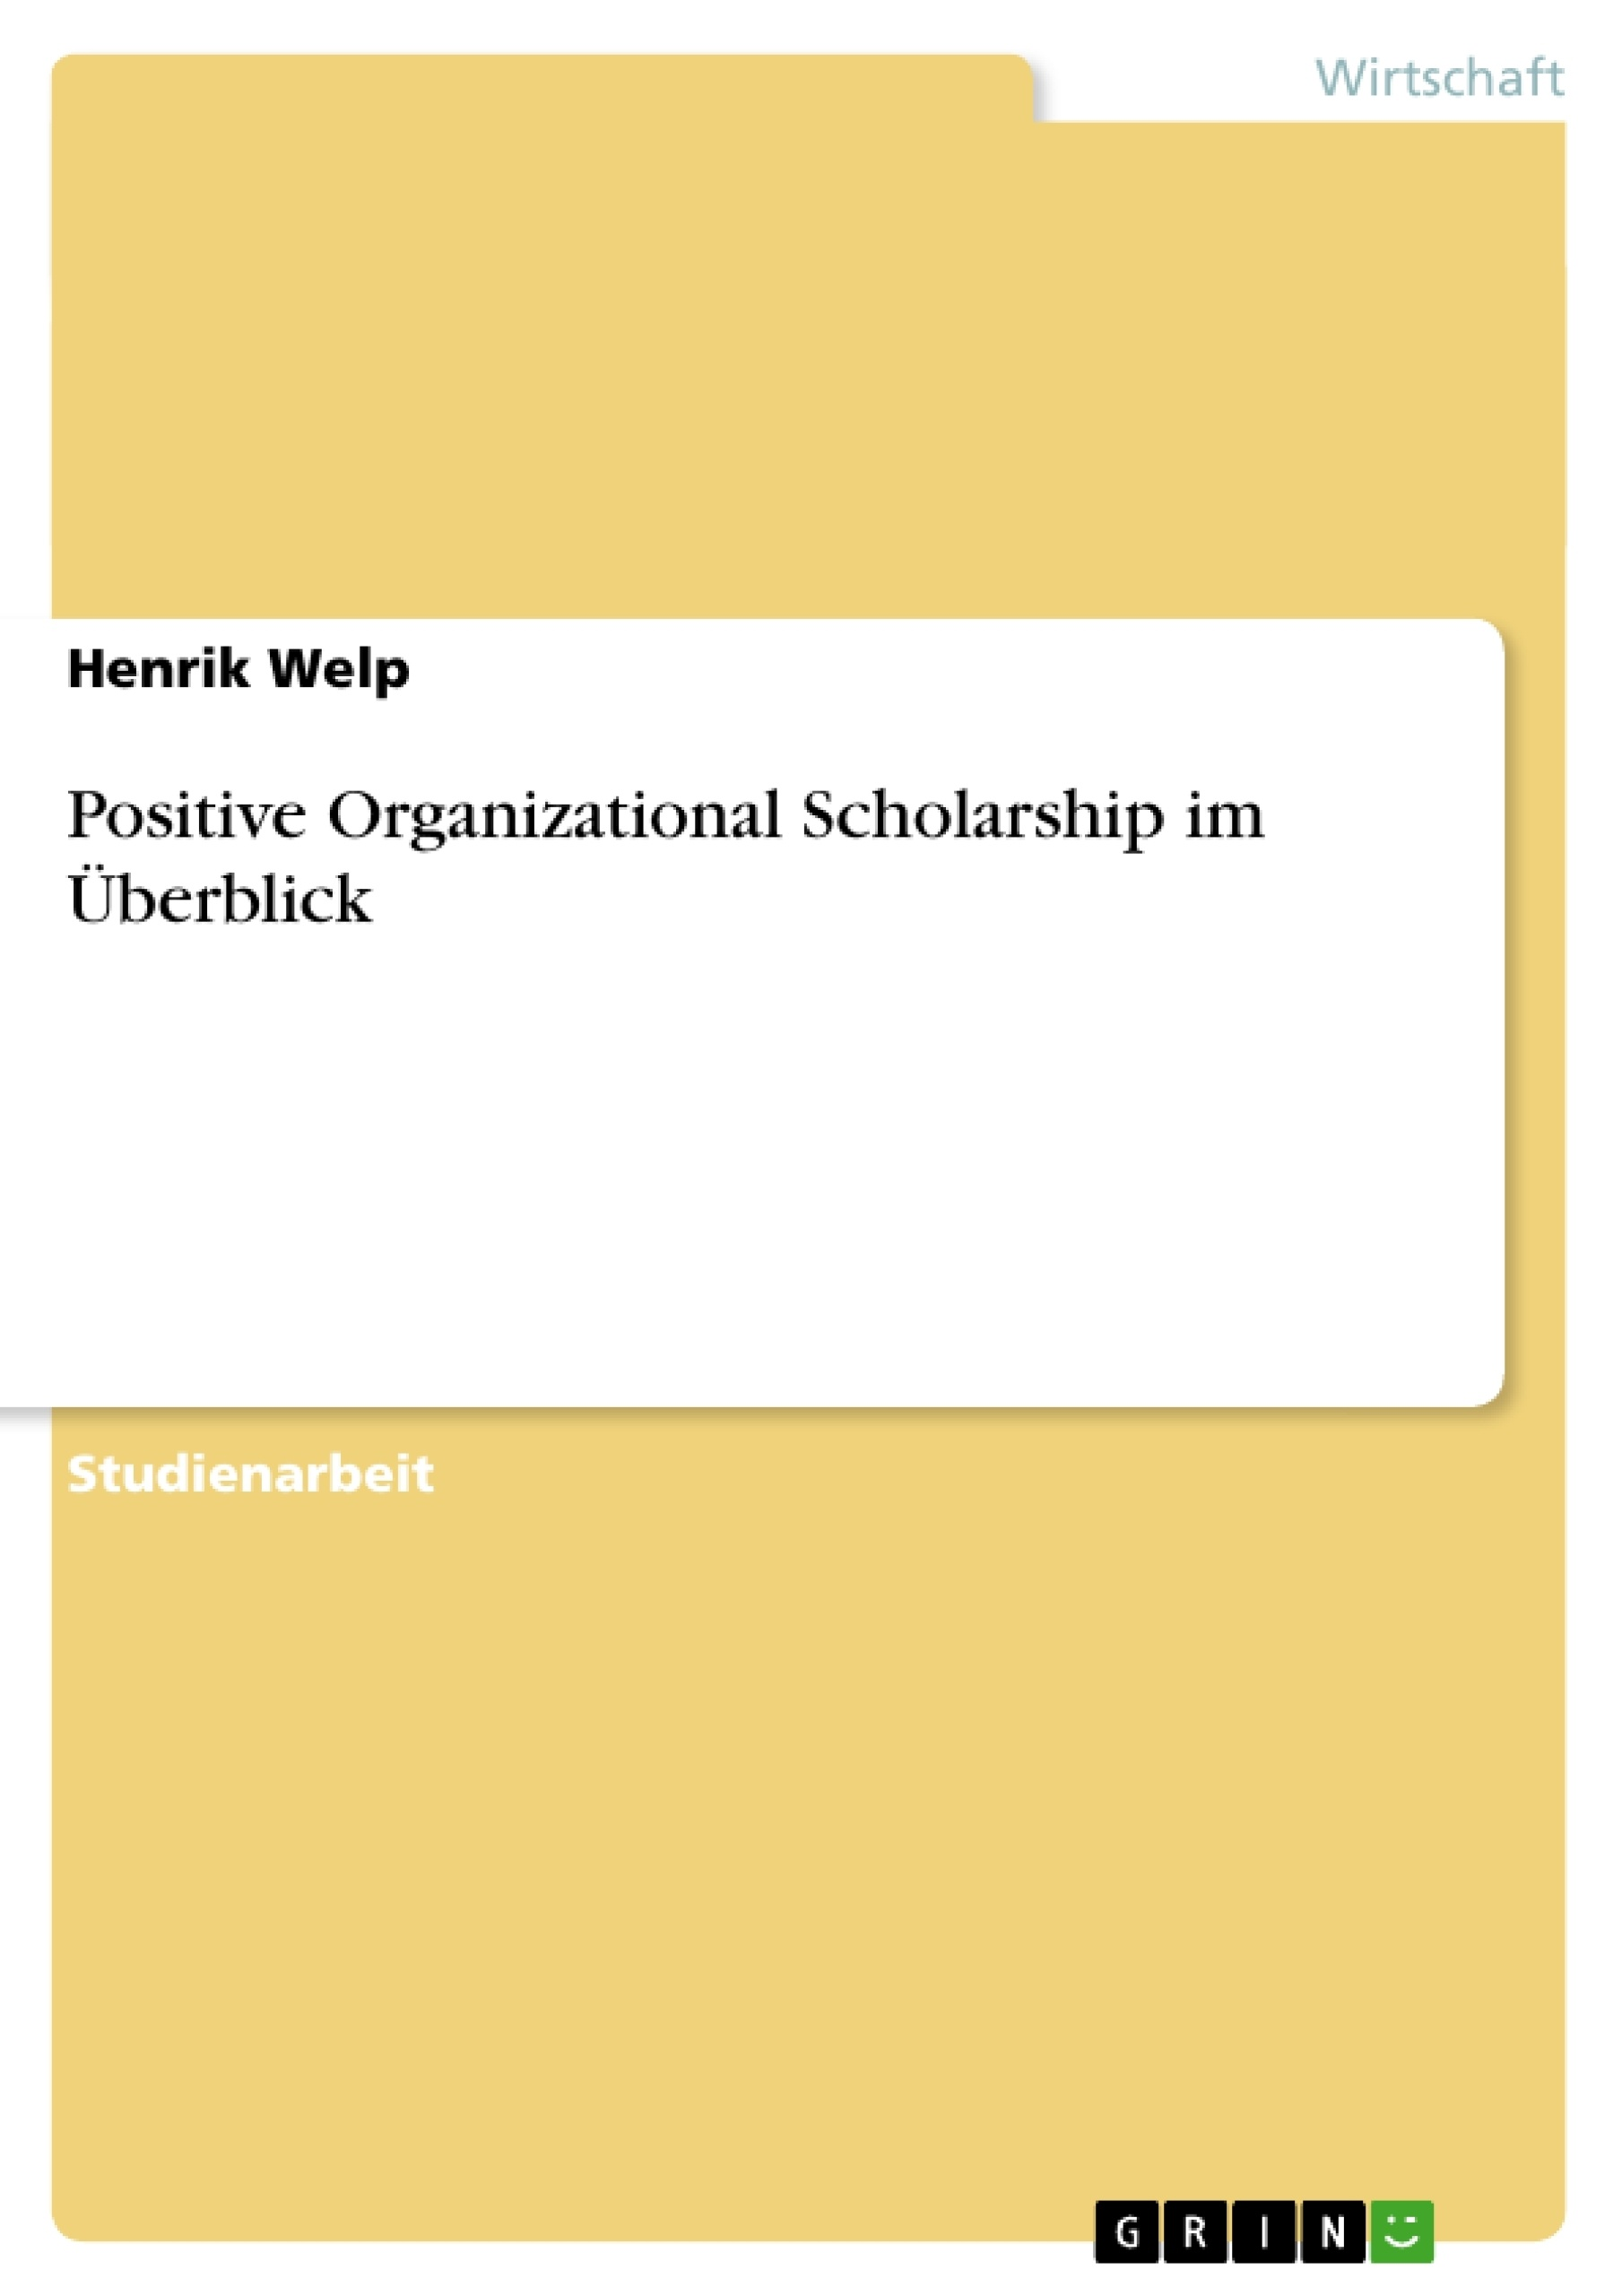 Titel: Positive Organizational Scholarship im Überblick